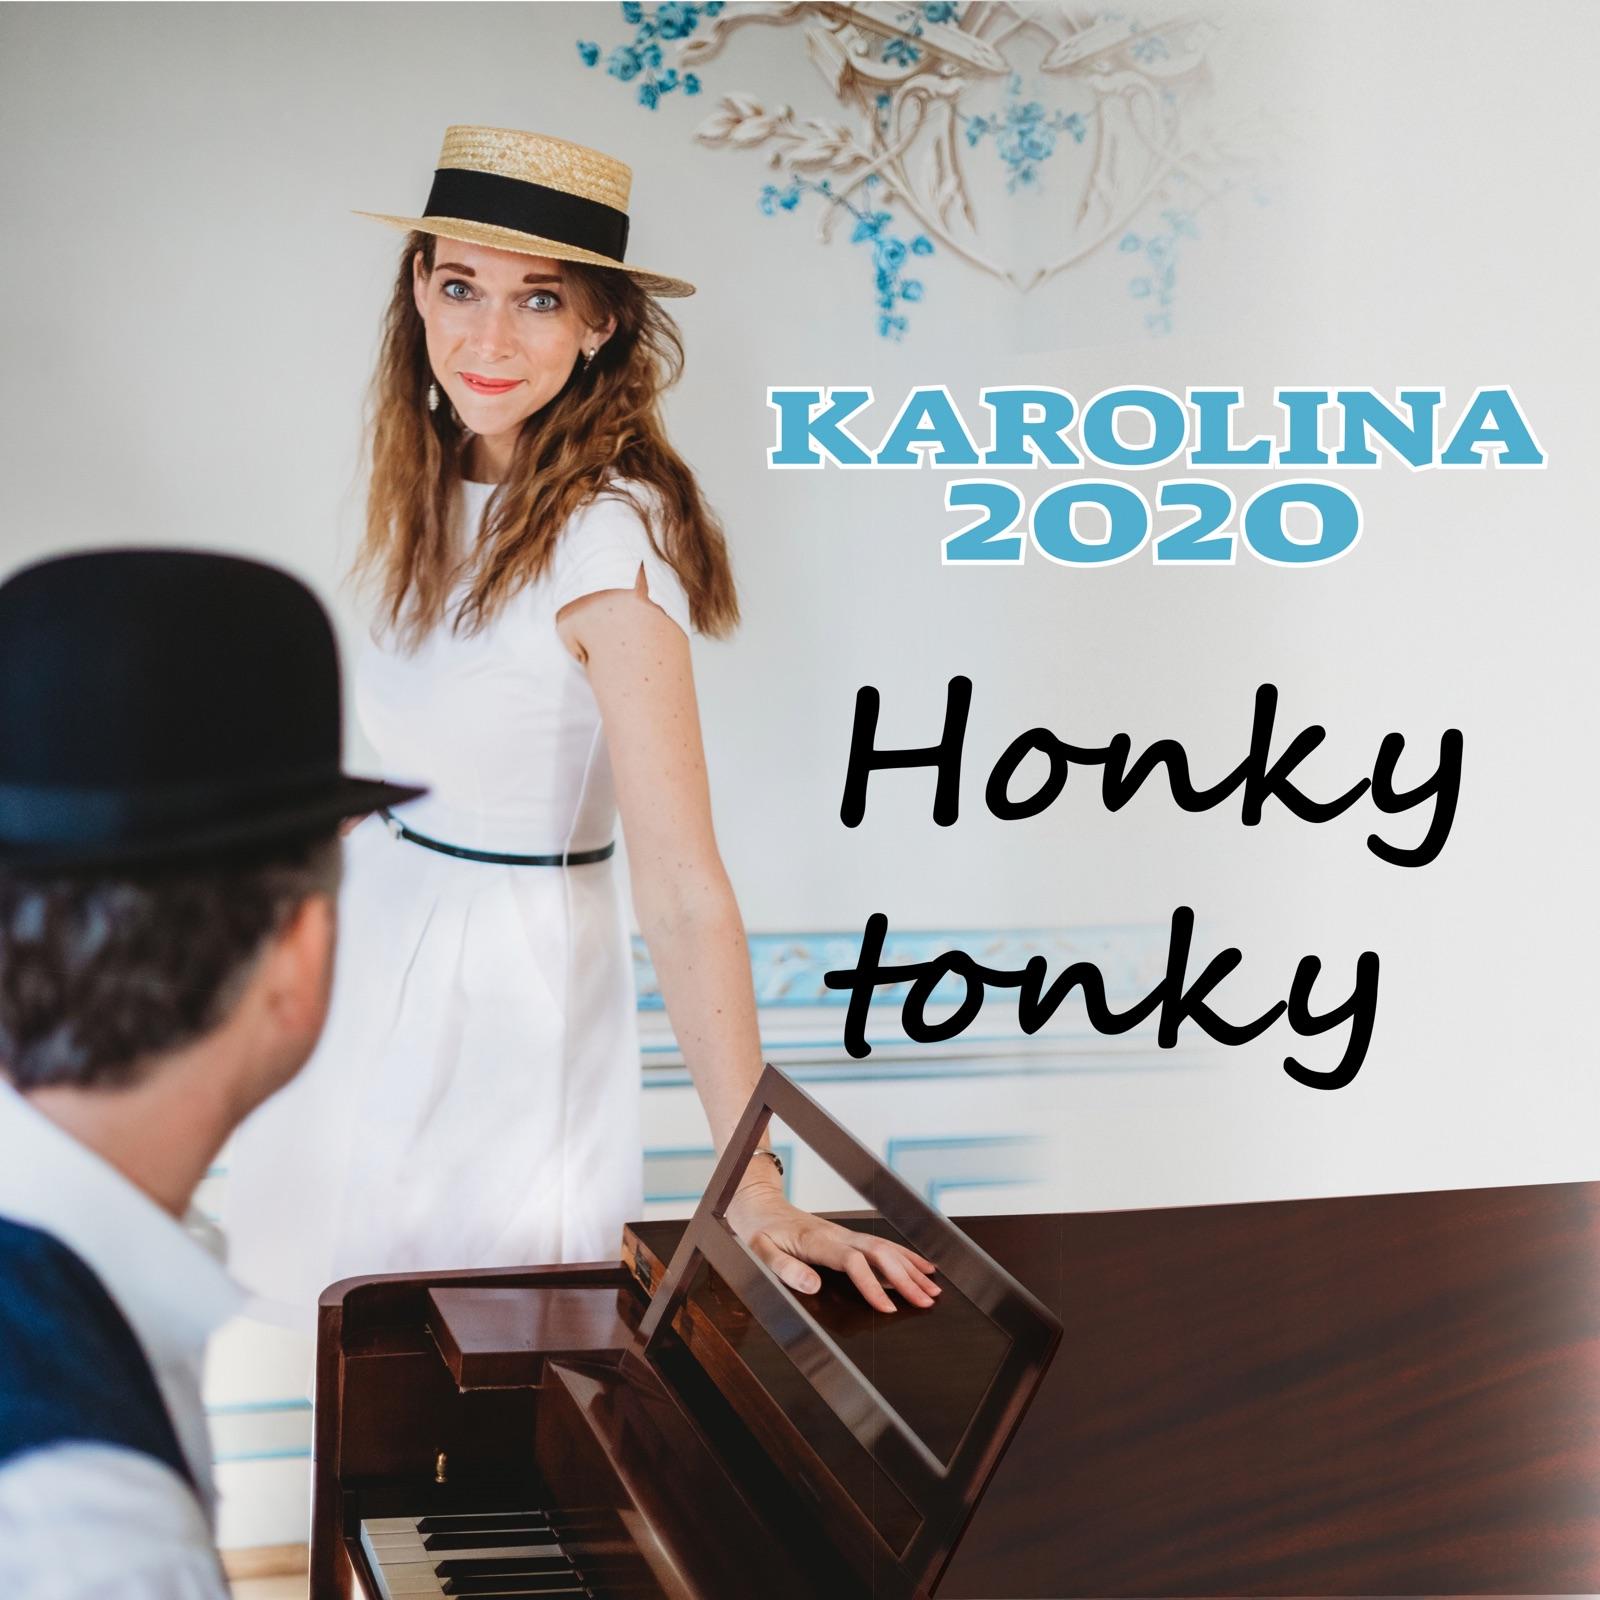 Honky Tonky